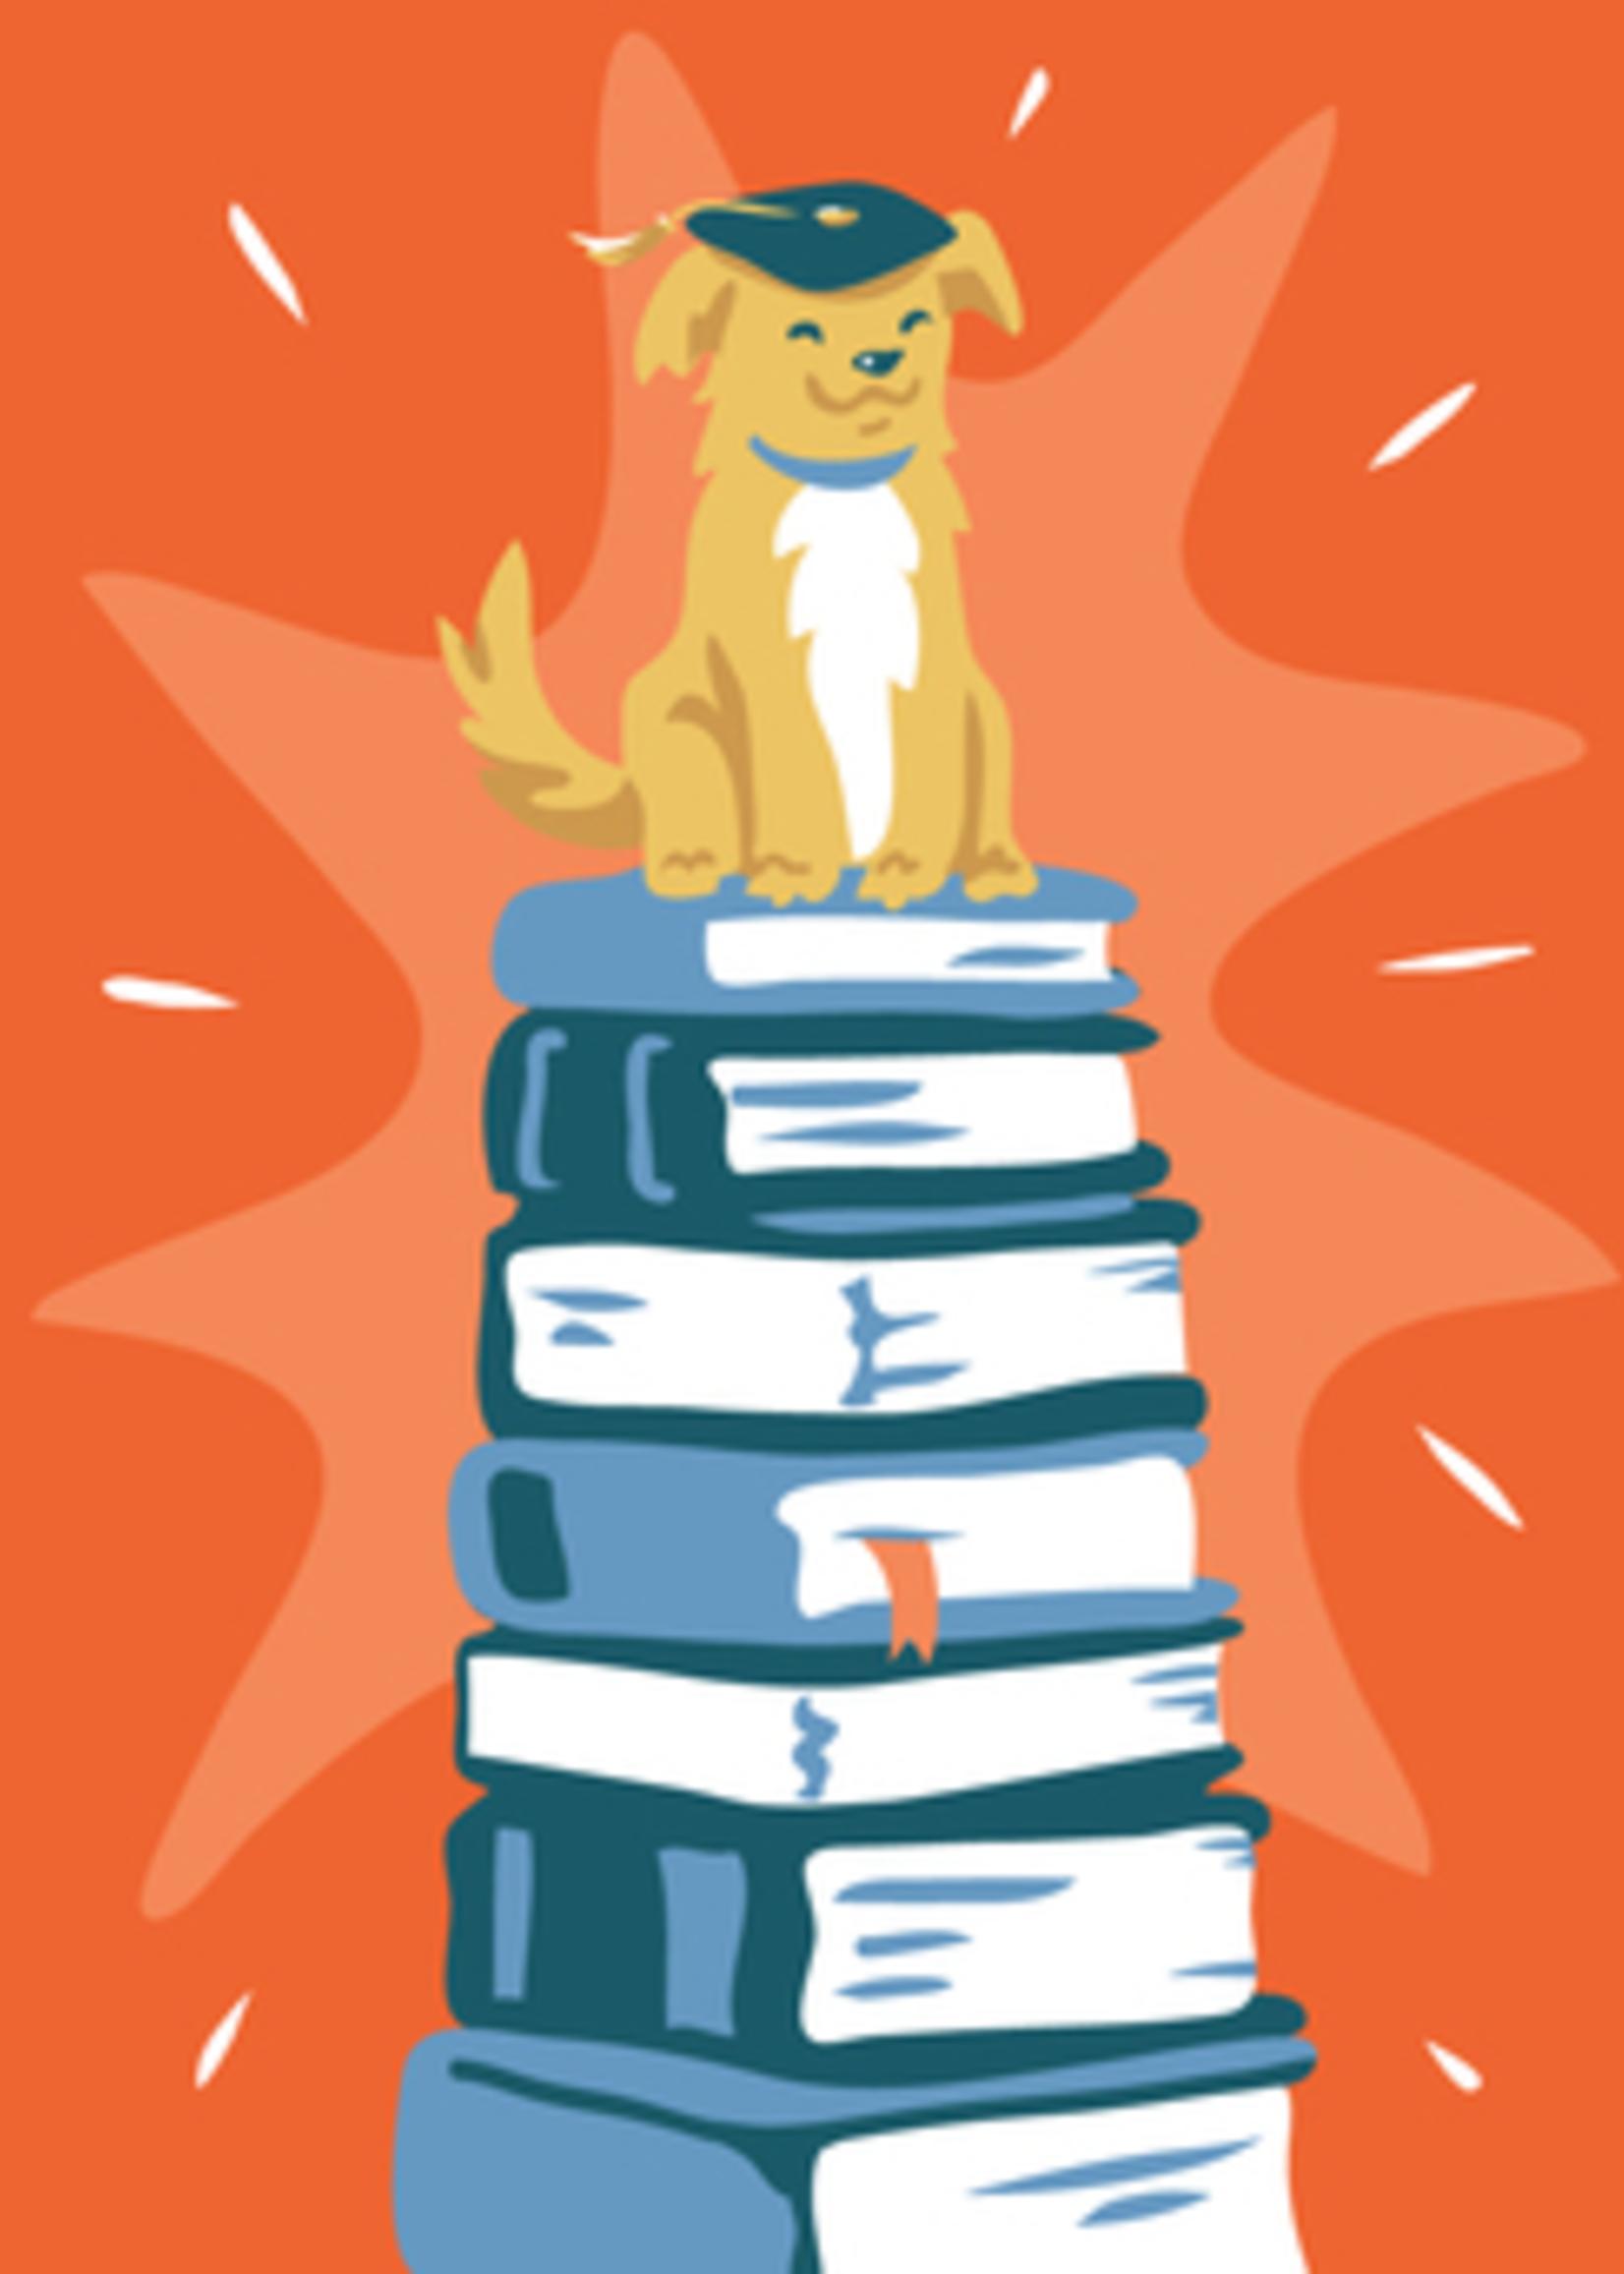 Card GRAD Dog on Stacks of Books